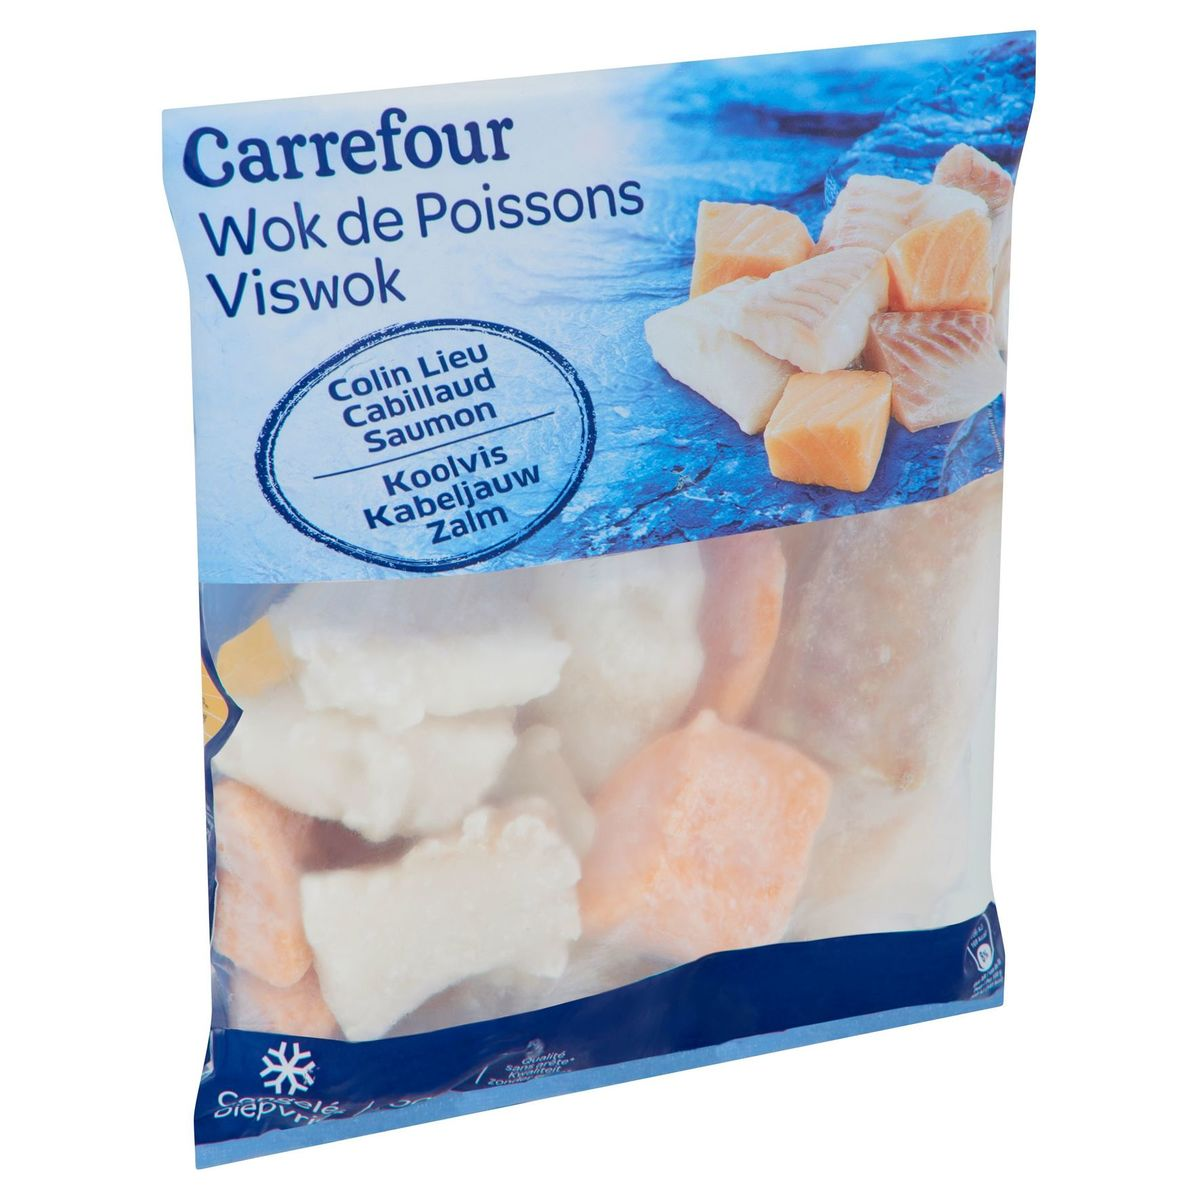 Carrefour Viswok Koolvis Kabeljauw Zalm 600 g